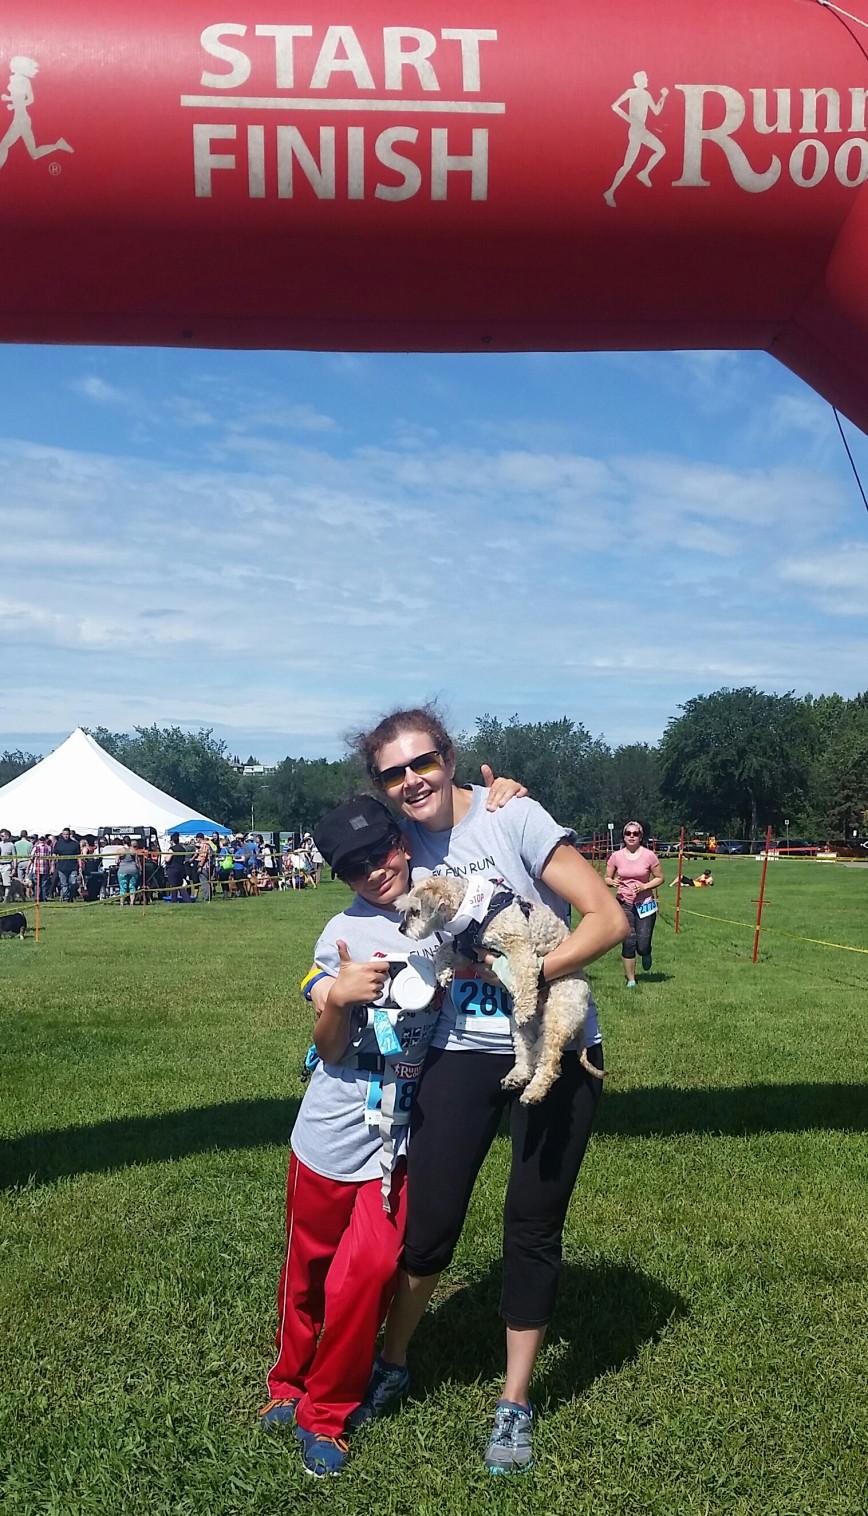 SPCA Pets in the Park Fun Run